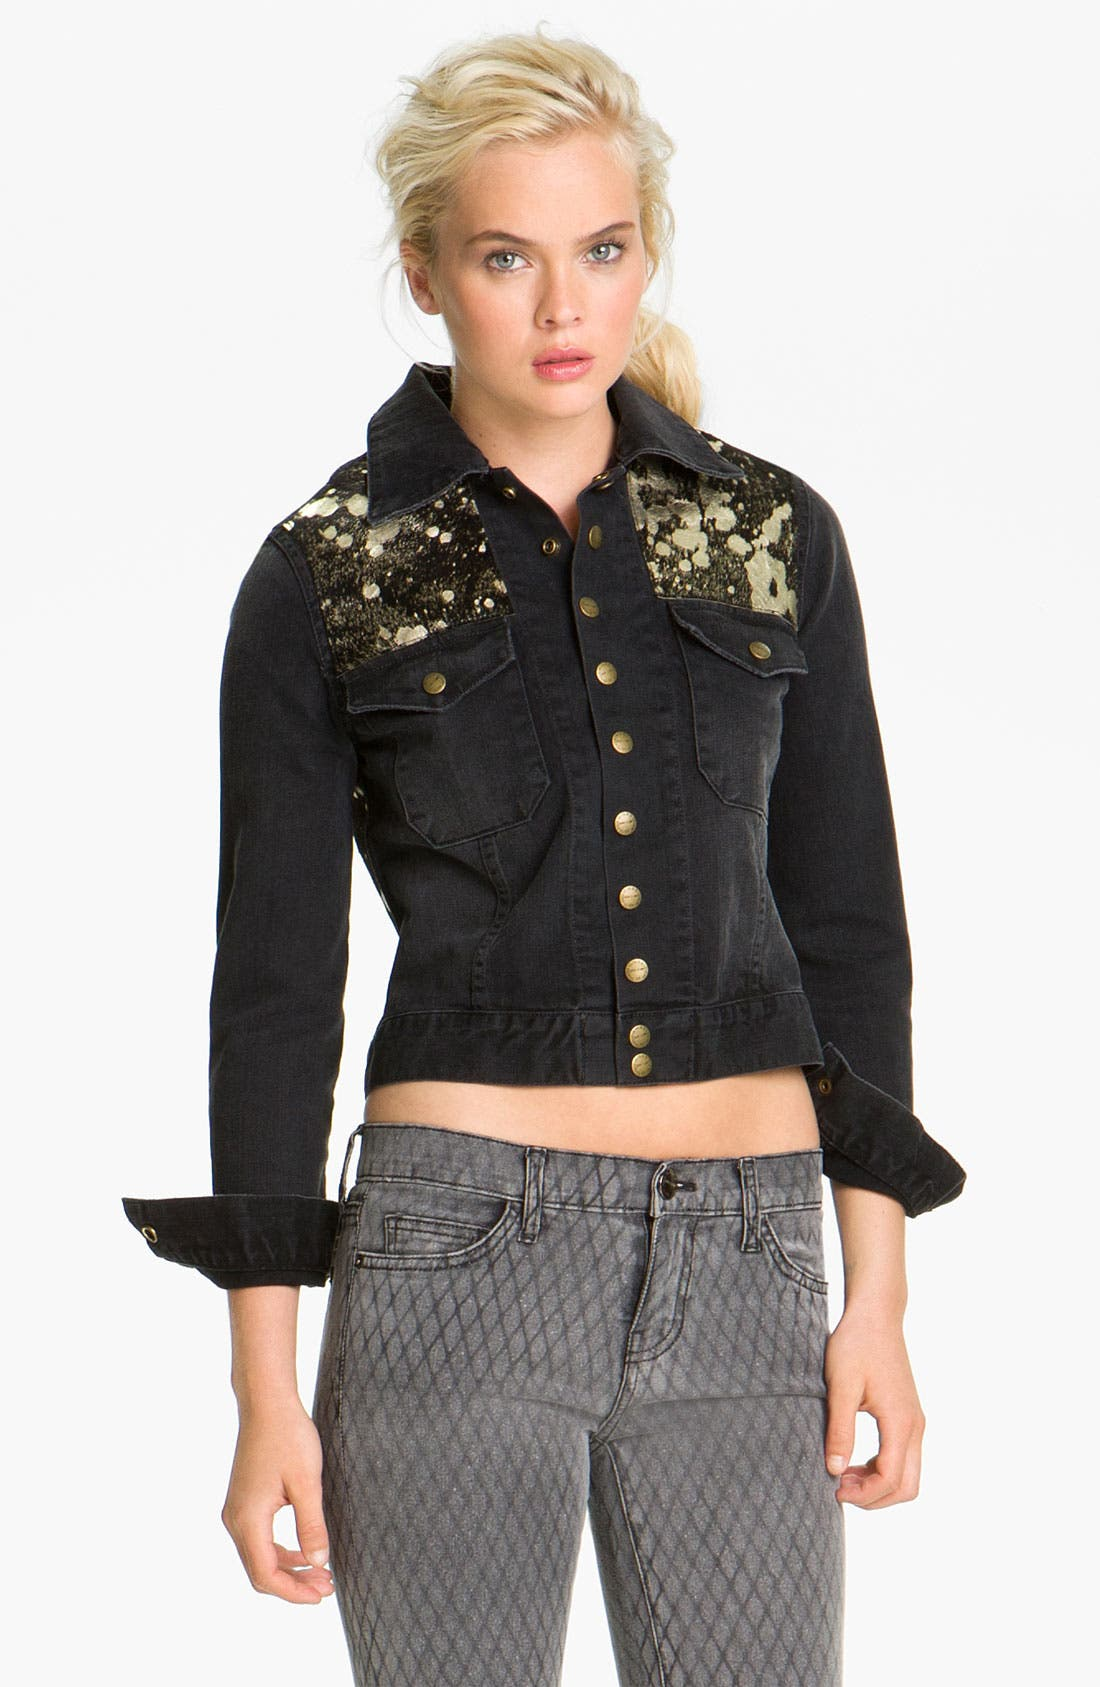 Main Image - Current/Elliott 'The Snap' Metallic Leather & Denim Jacket